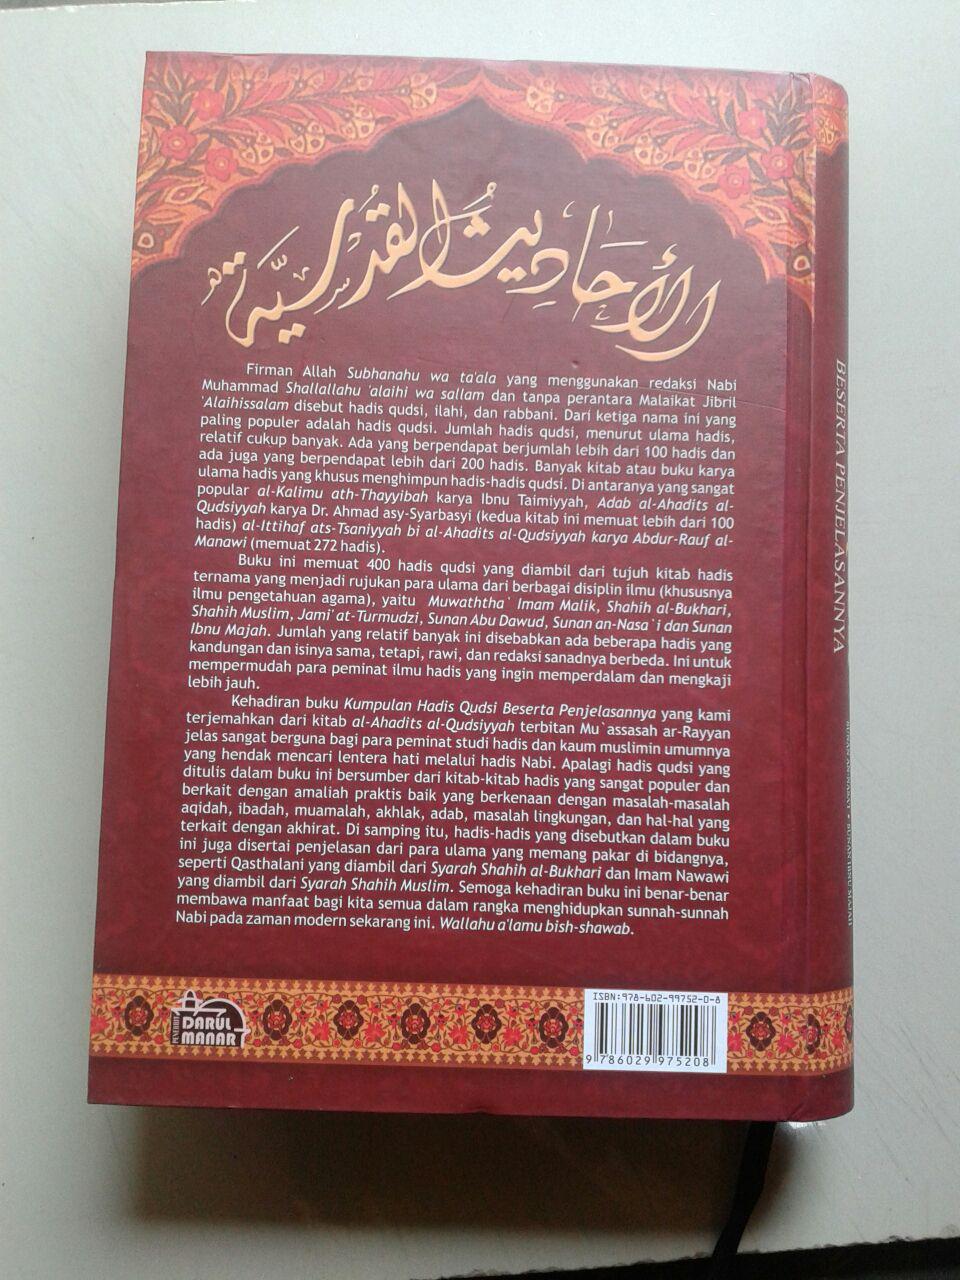 Buku Kumpulan Hadits Qudsi Berserta Penjelasannya cover